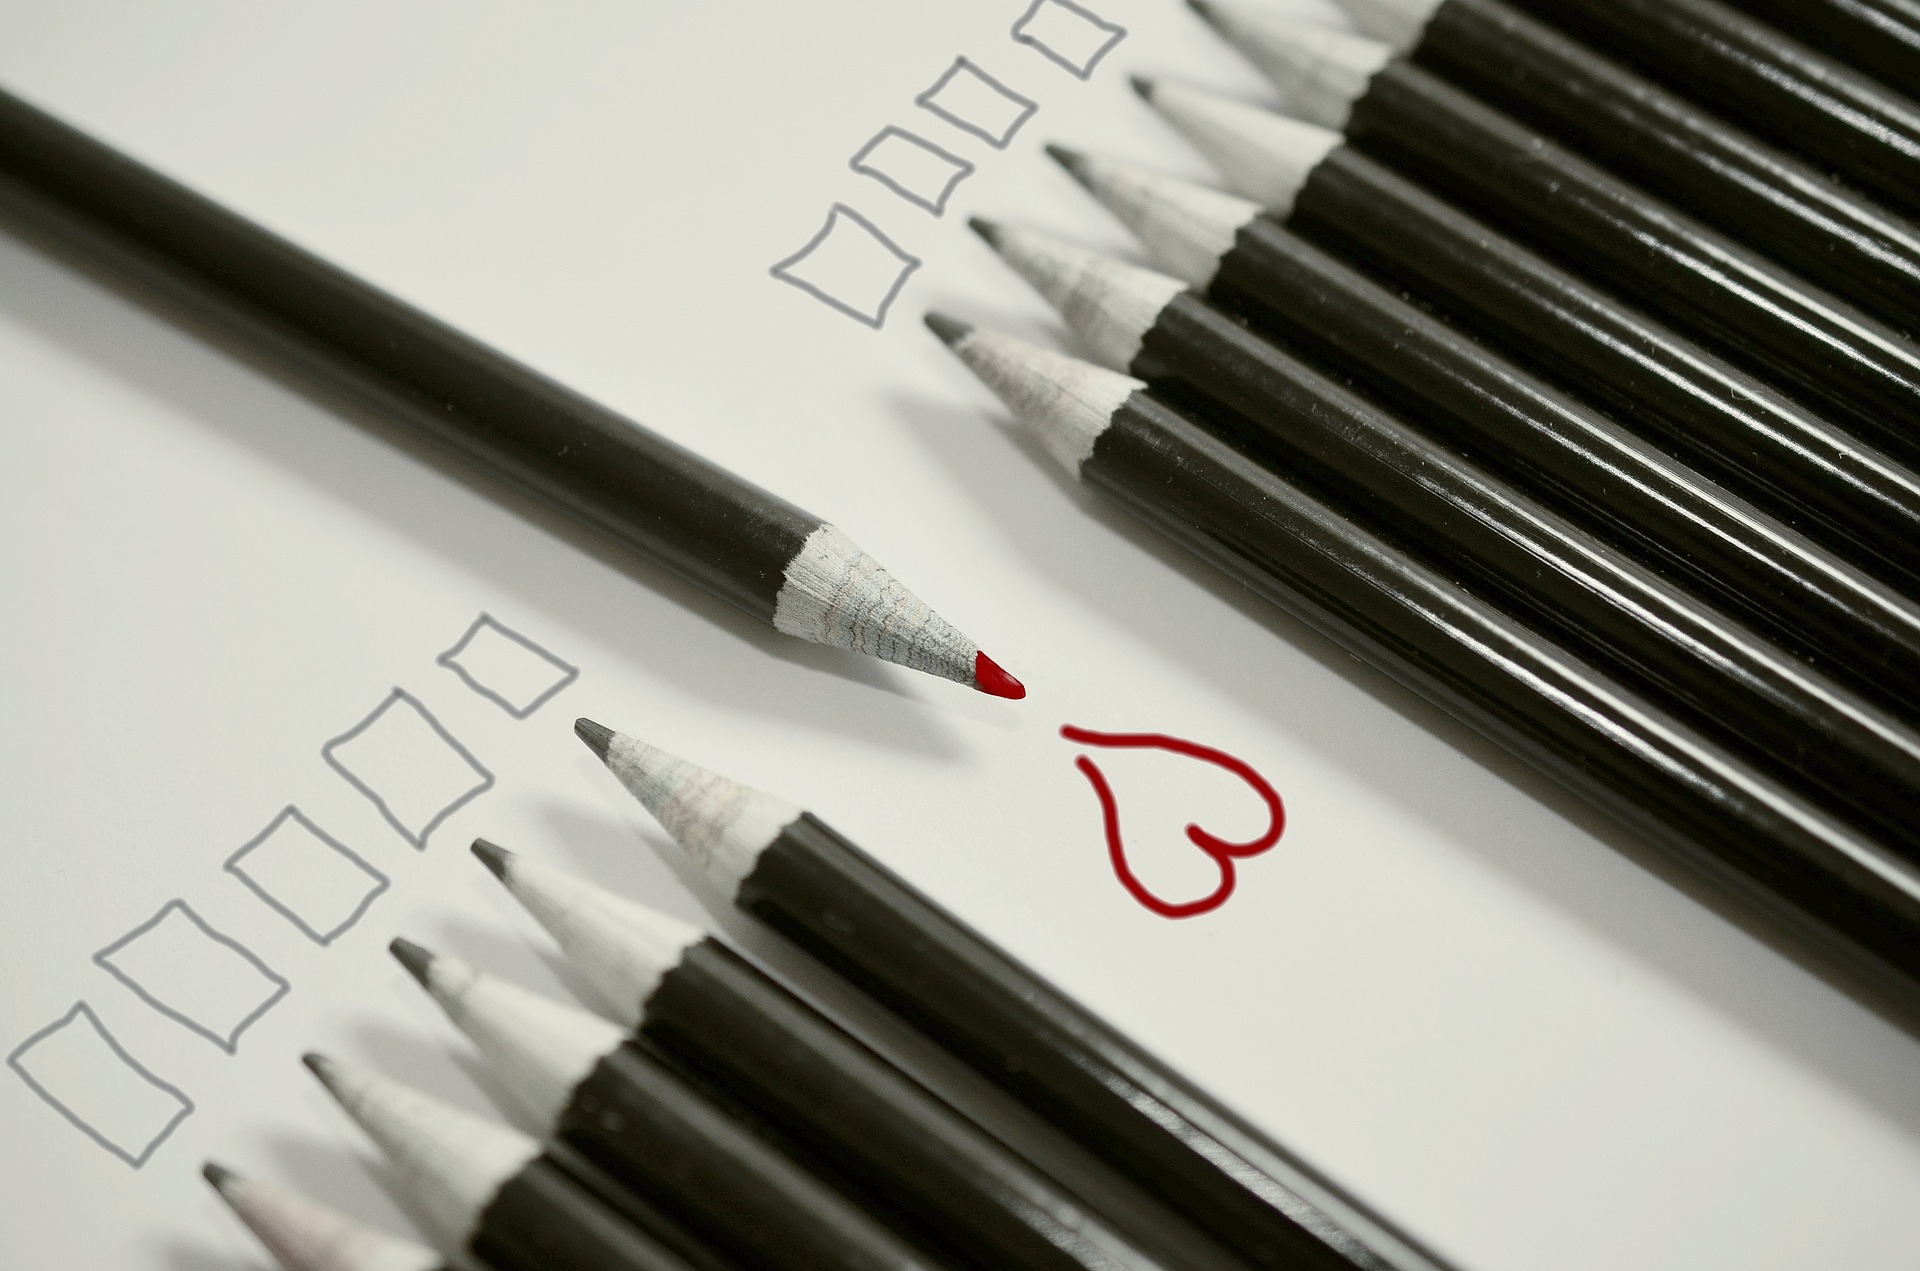 pencils-806604_1920.jpg